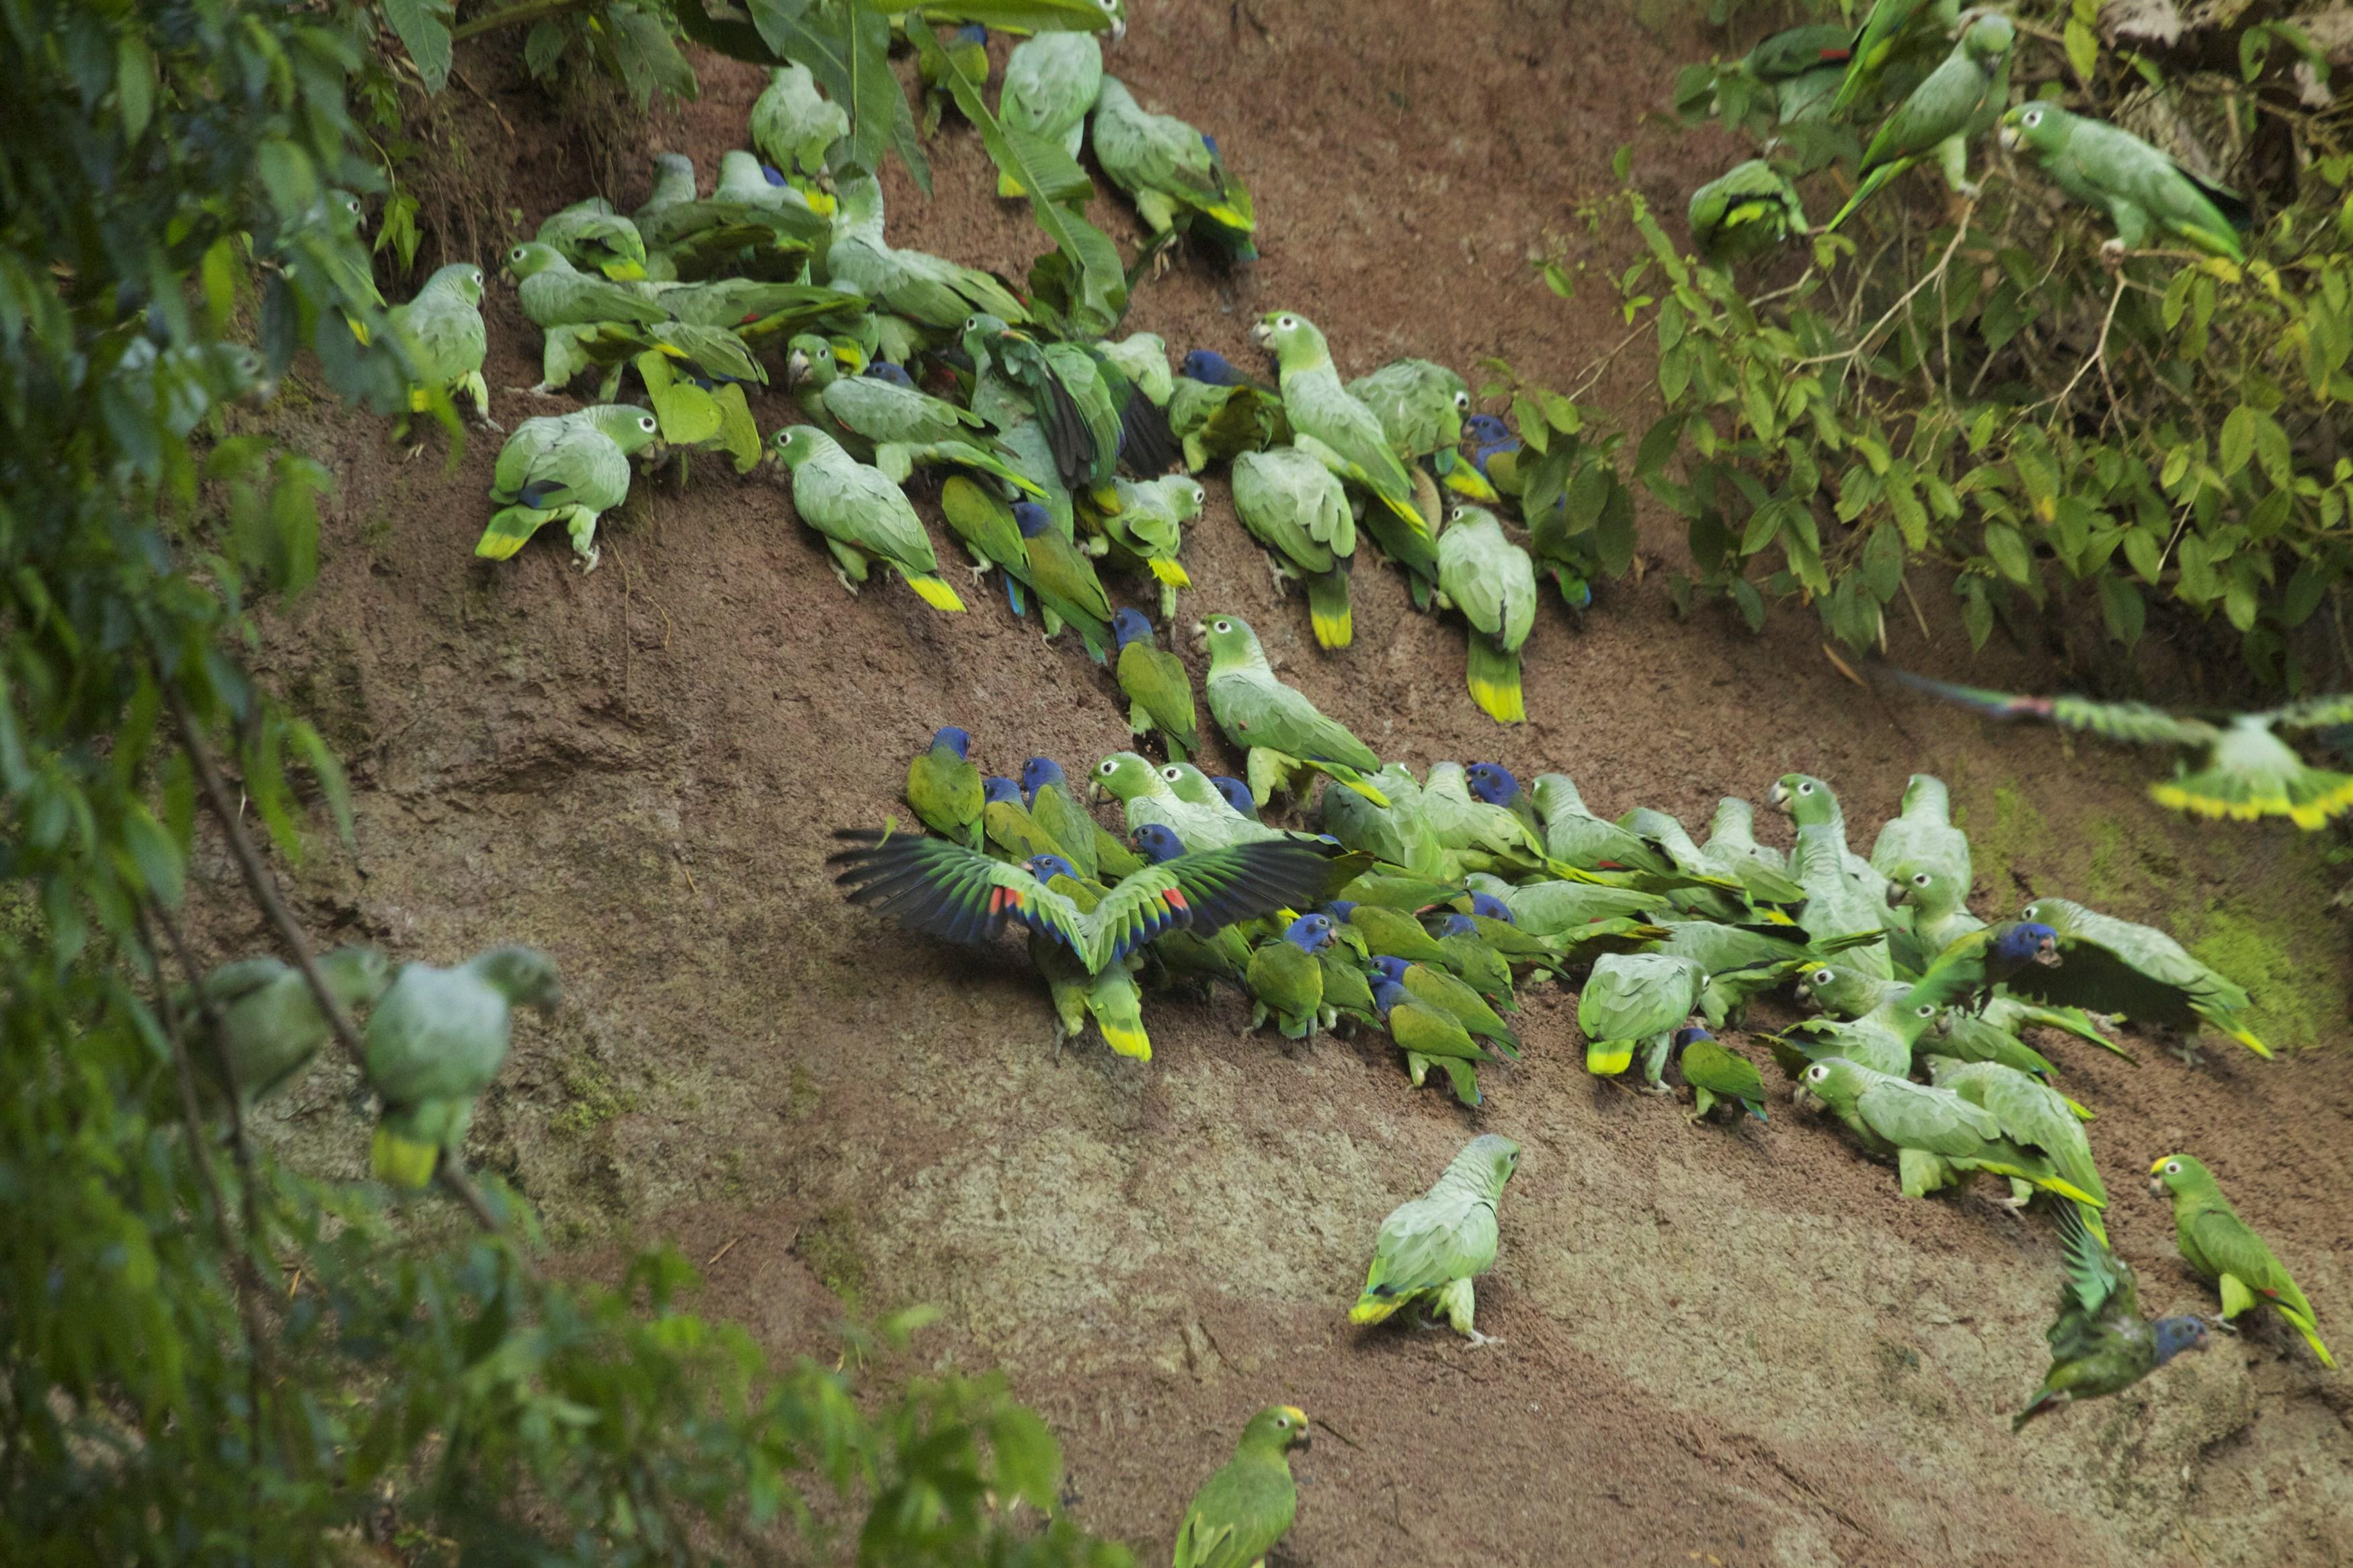 blue-headed-pionus-parrots-in-yasuni-national-park-ecuador_ecbe-3500x2333px